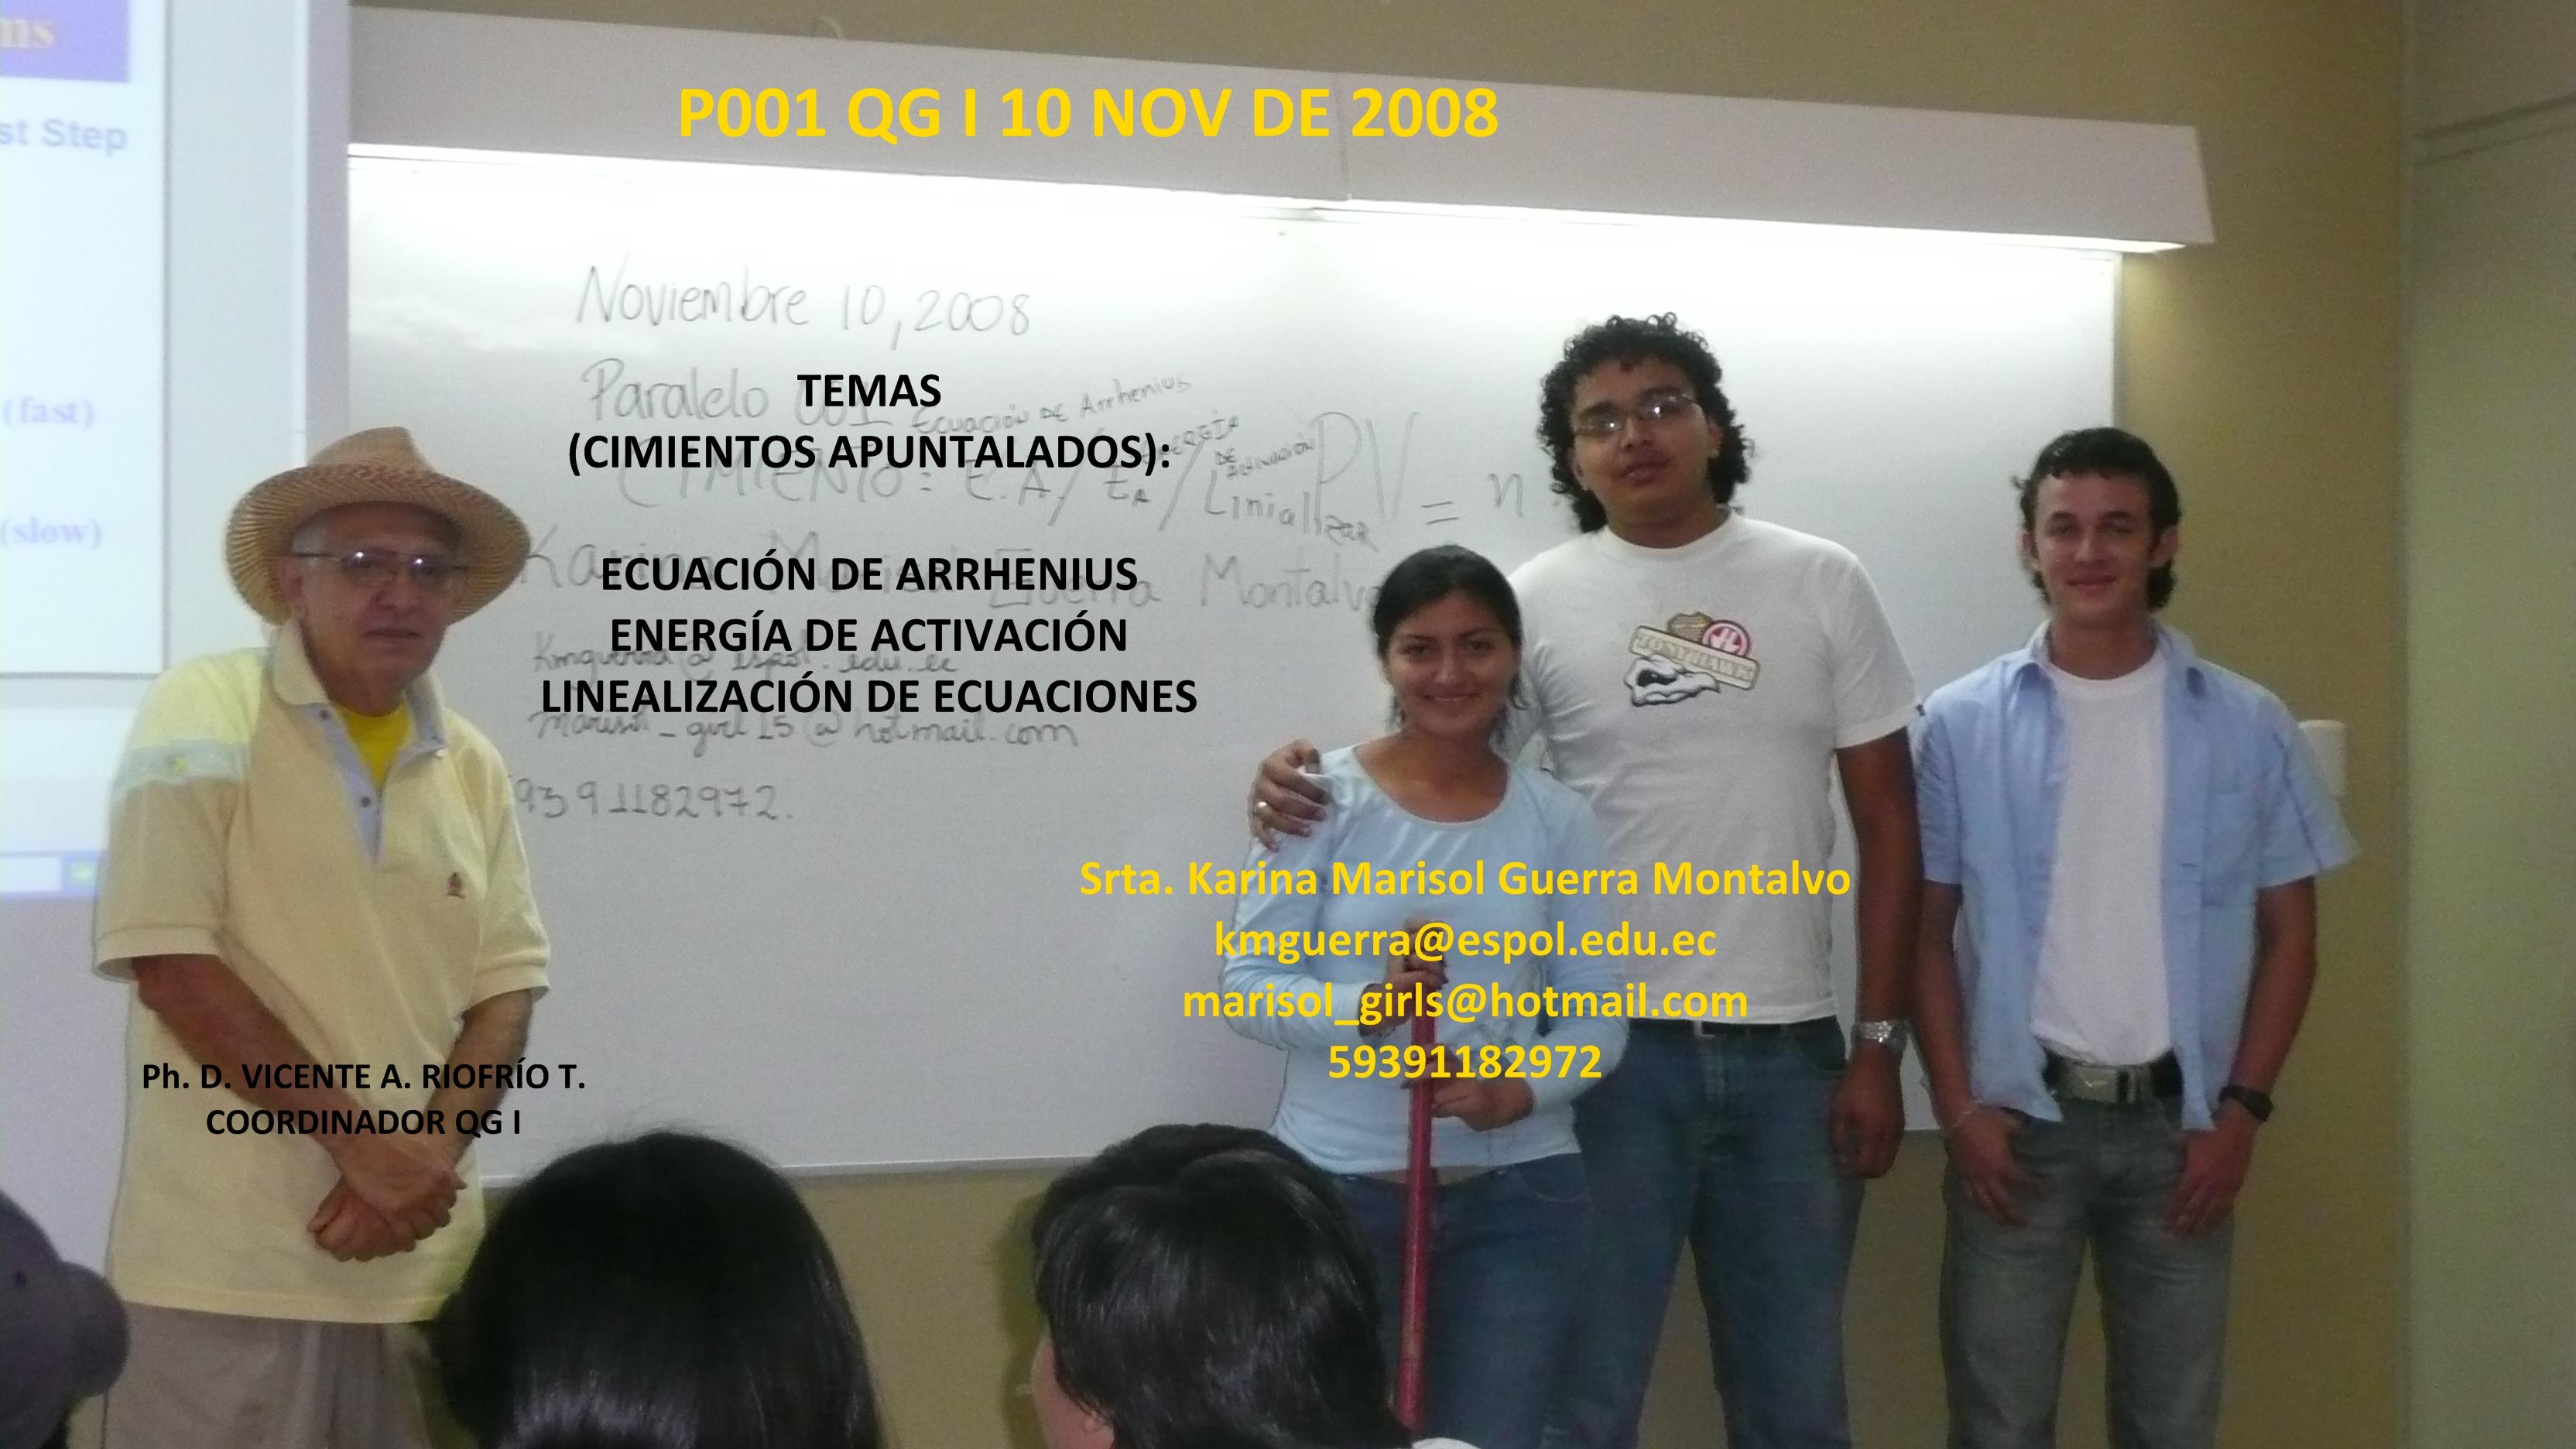 Srta. Karina Marisol Guerra Montalvo / RESPONSABLE POR 10 / 11 / 08